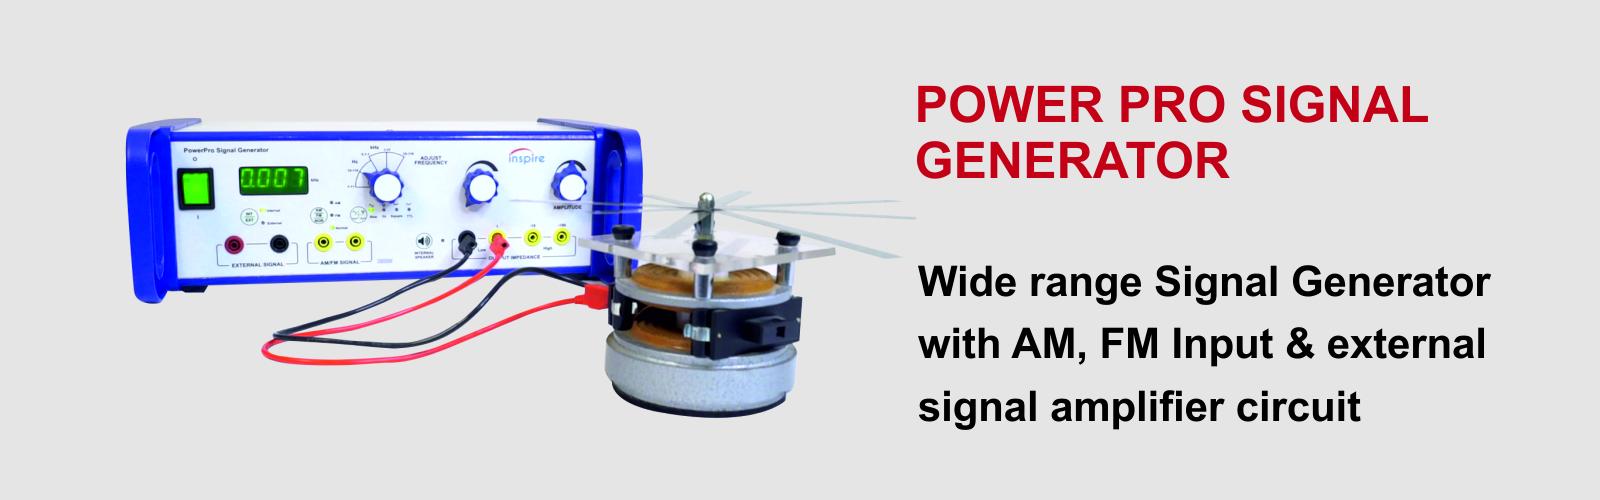 Power Pro Signal Generator